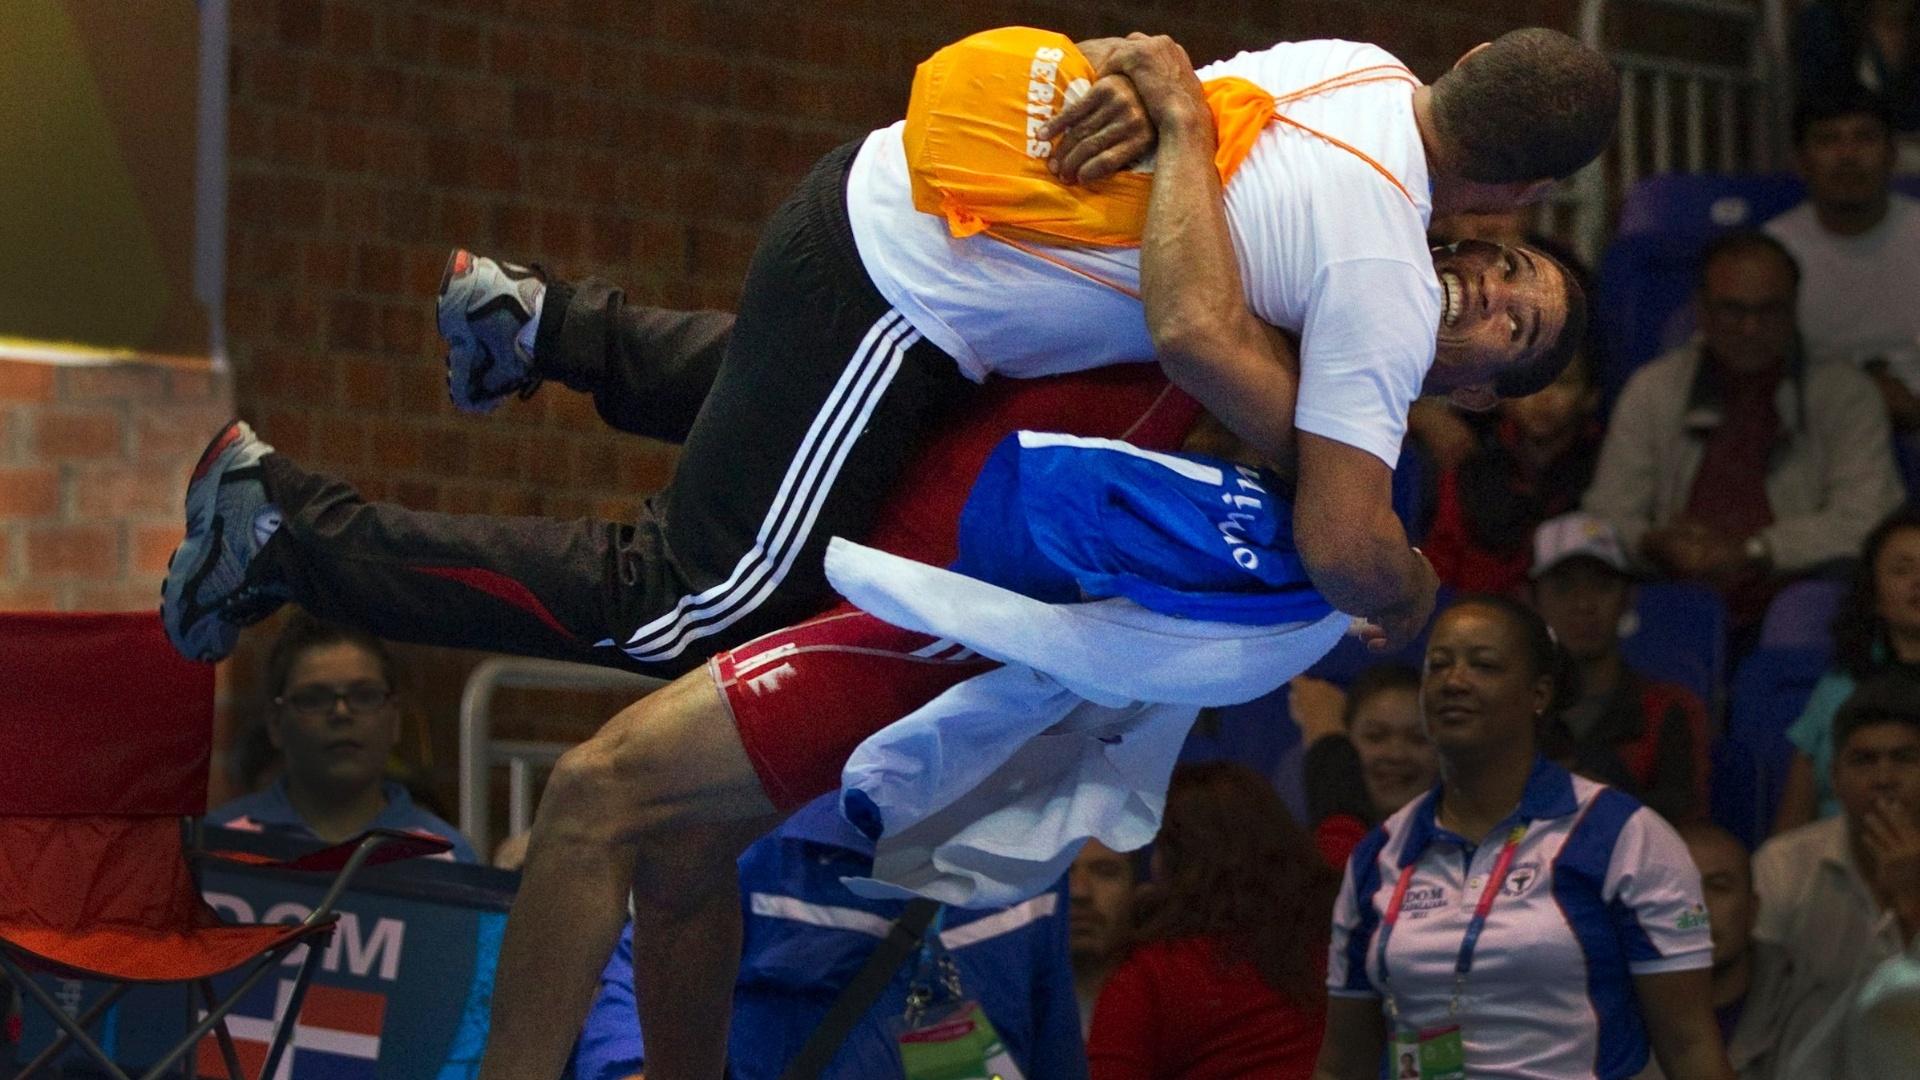 Brea Anyelo Mota, da República Dominicana carrega seu técnico depois de vencer a luta contra o mexicano Ulises Barragan